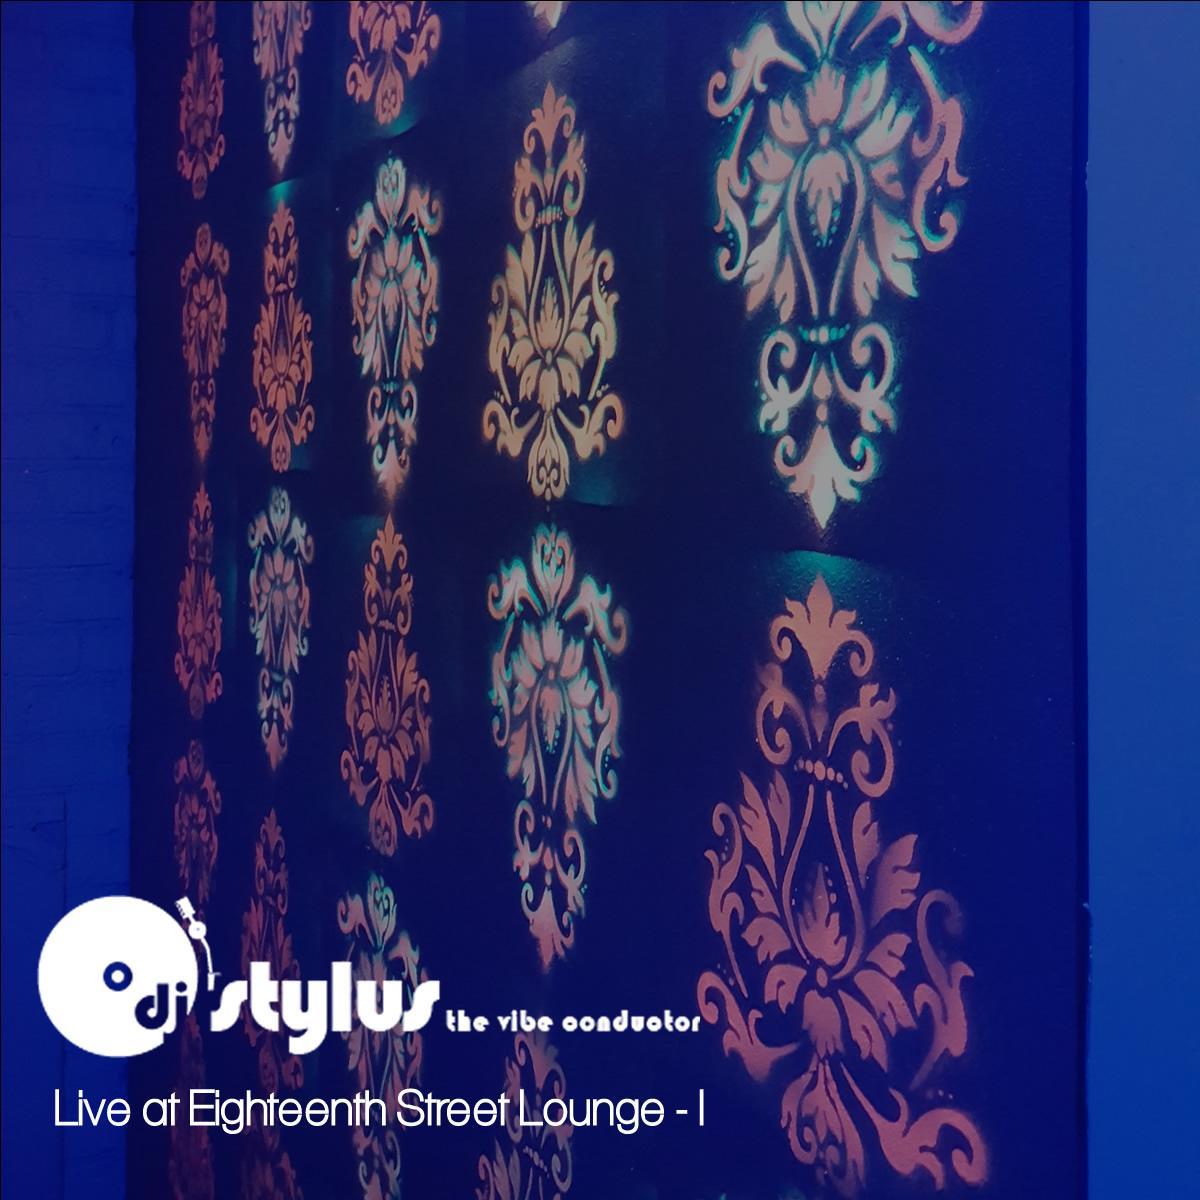 DJ Stylus: Live at Eighteenth Street Lounge Vol. 1